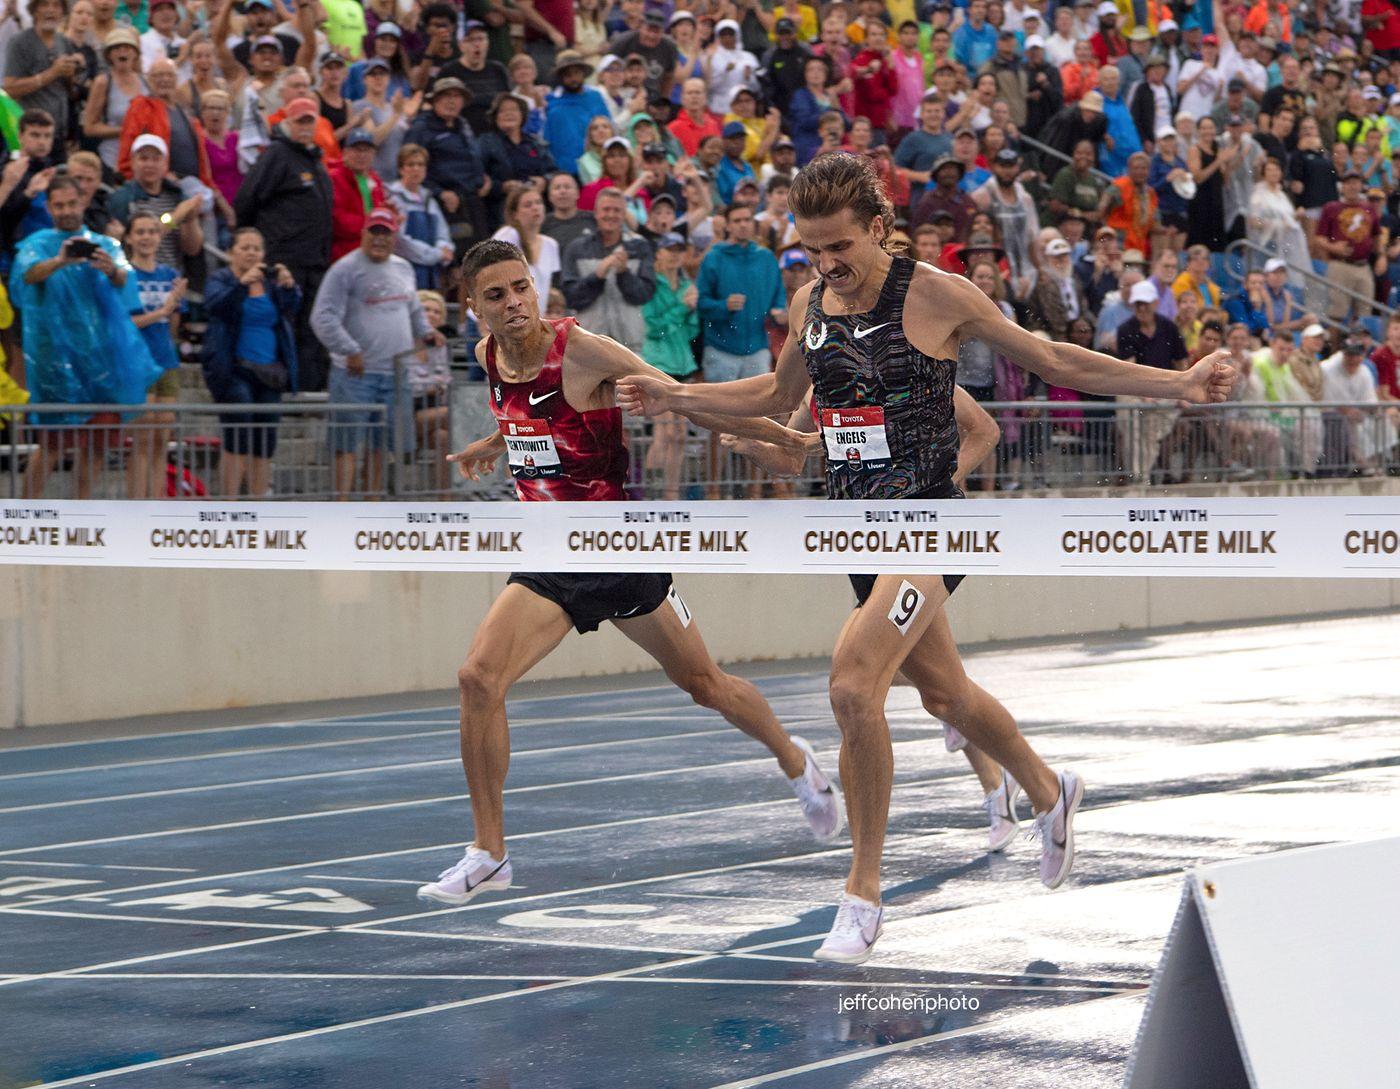 engels-centrowitz-1500m-2019-USATF-Outdoor-Champs-day-4-7055---jeff-cohen-photo--web.jpg